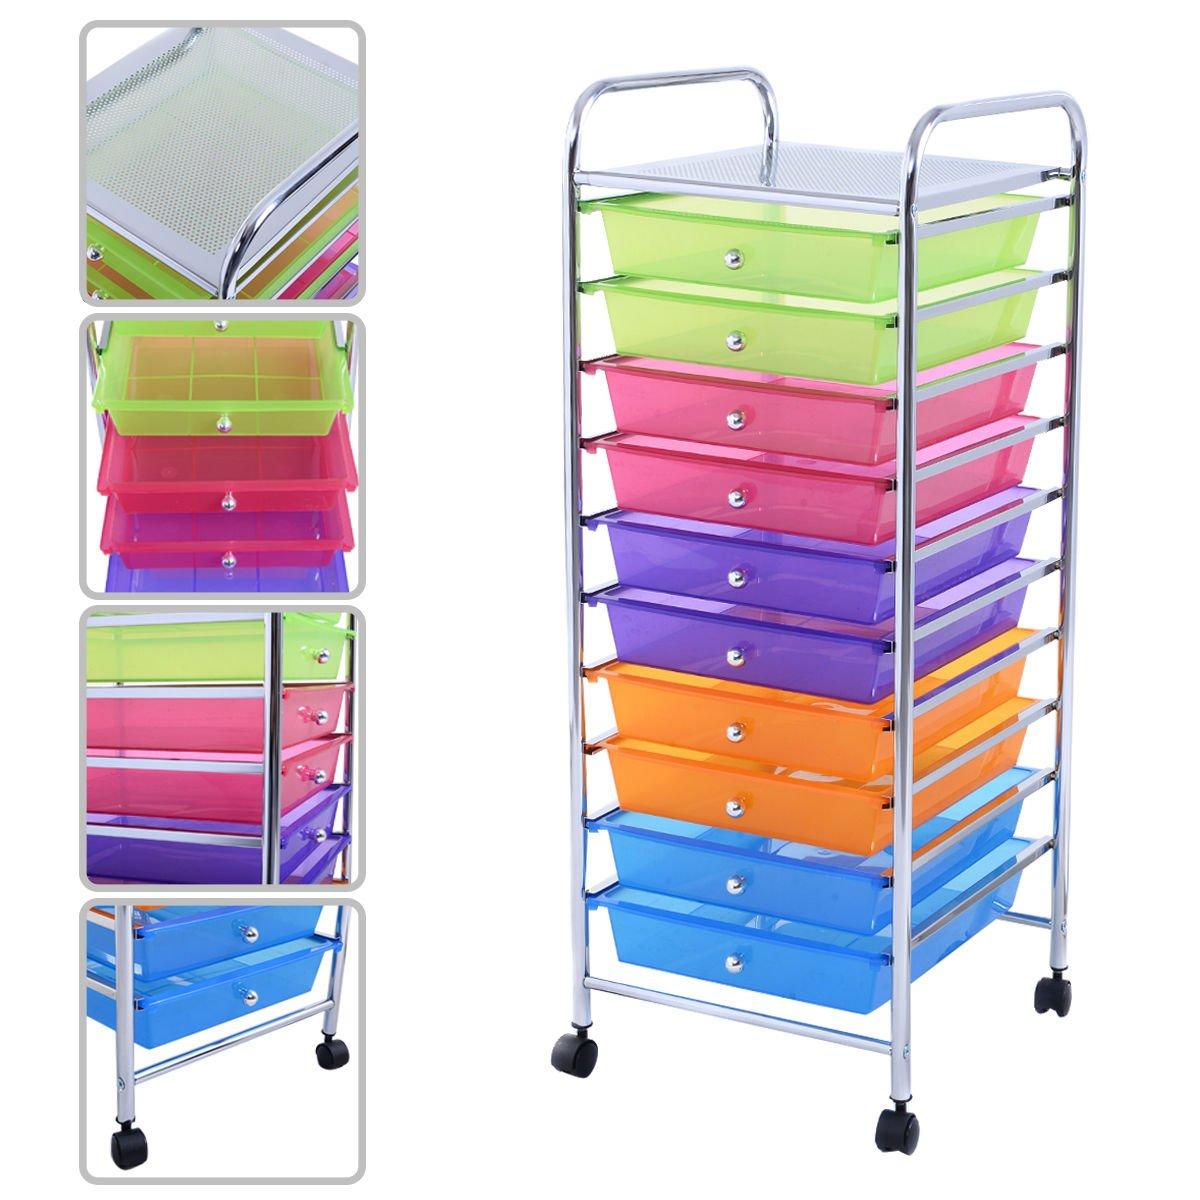 KAYSEV 10 Drawer Rolling Storage Organizer Cart, Multi-Purpose Scrapbook Paper Office School Utility Organizer Rainbow, Tray Drawer (Multi-Color)